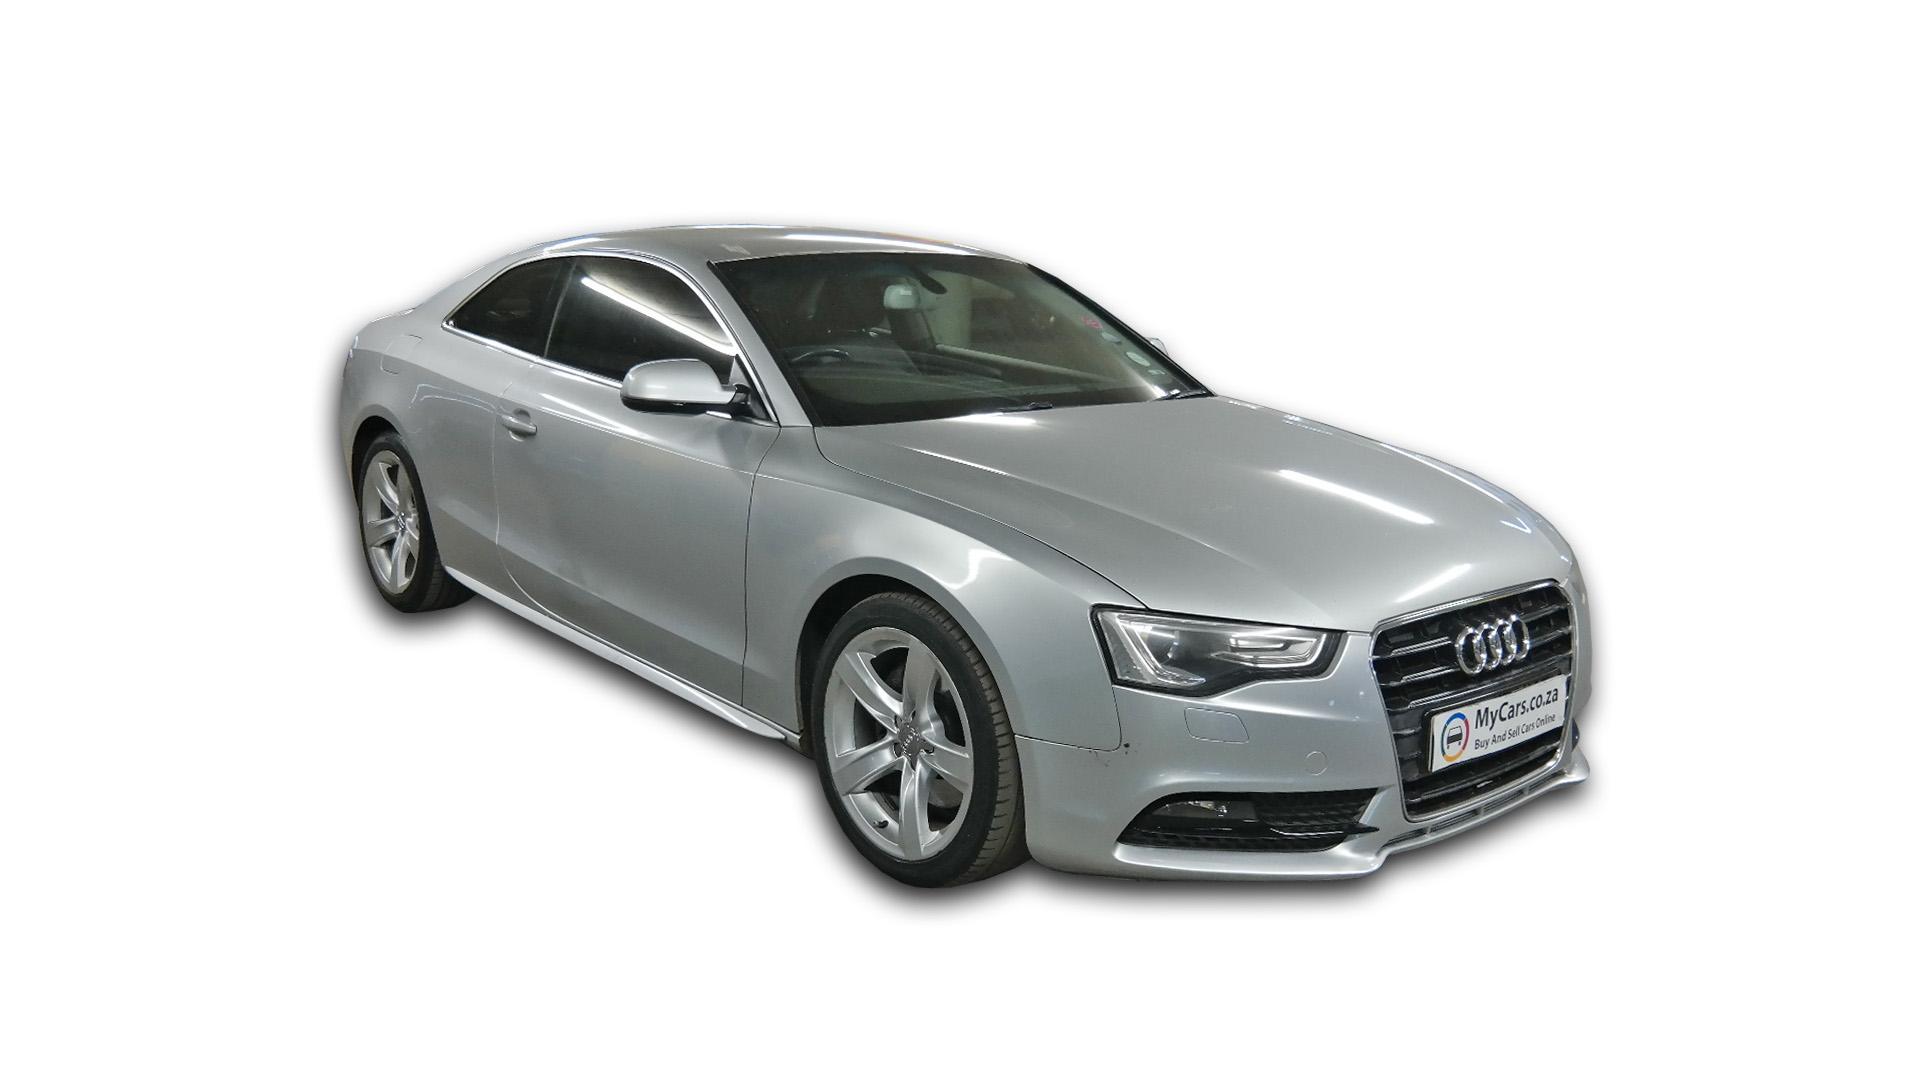 Audi A5 2.0T Fsi Multitronic